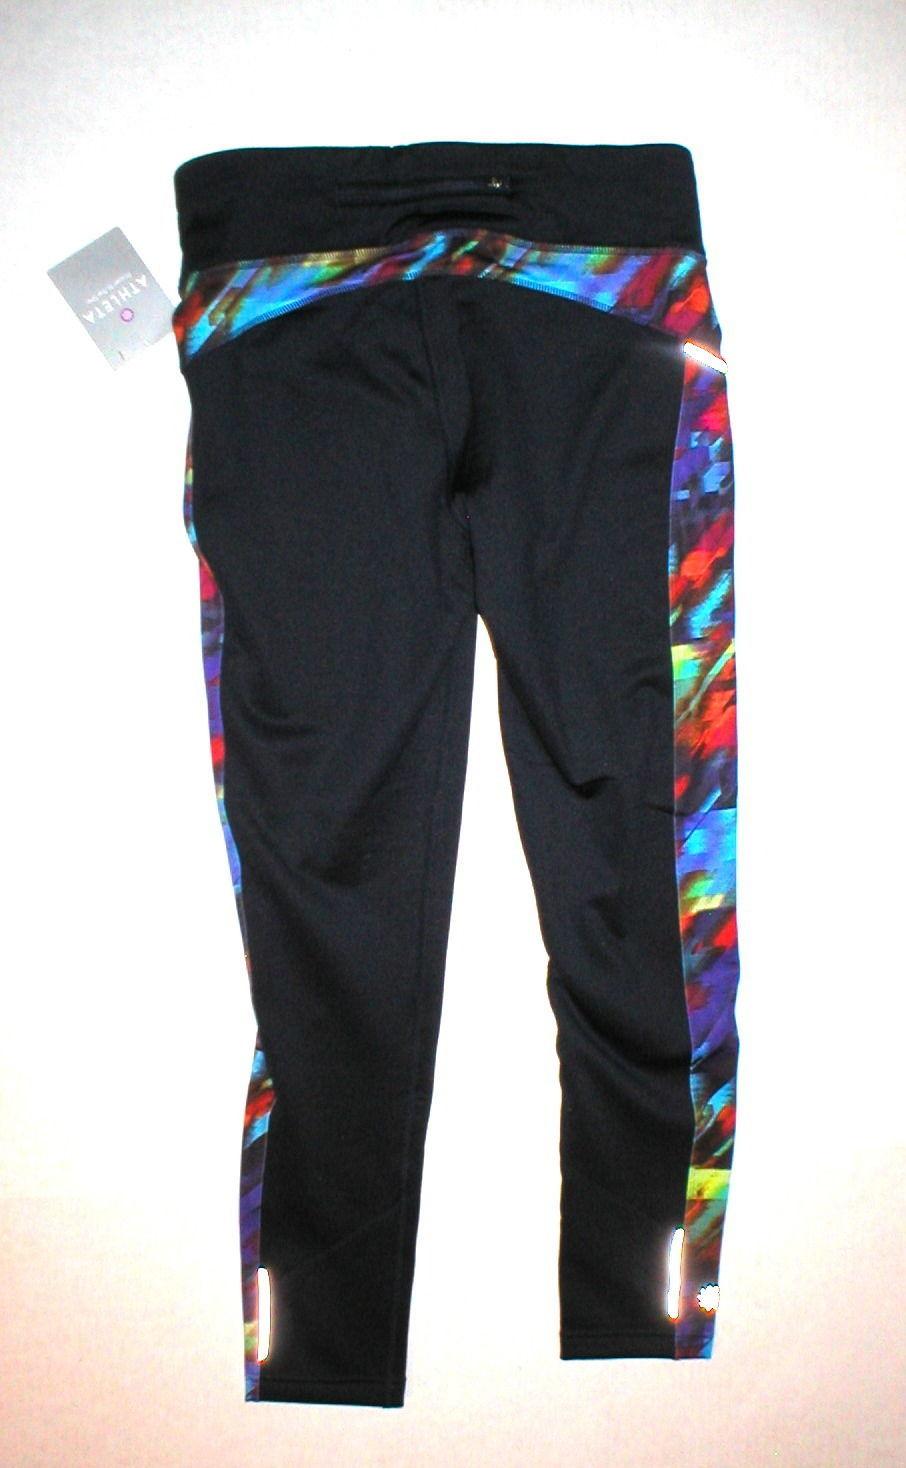 3cc42b47c33ee7 Womens Athleta NWT New Warm Power Lift Legging Lined Pants Winter XL Blue  Red